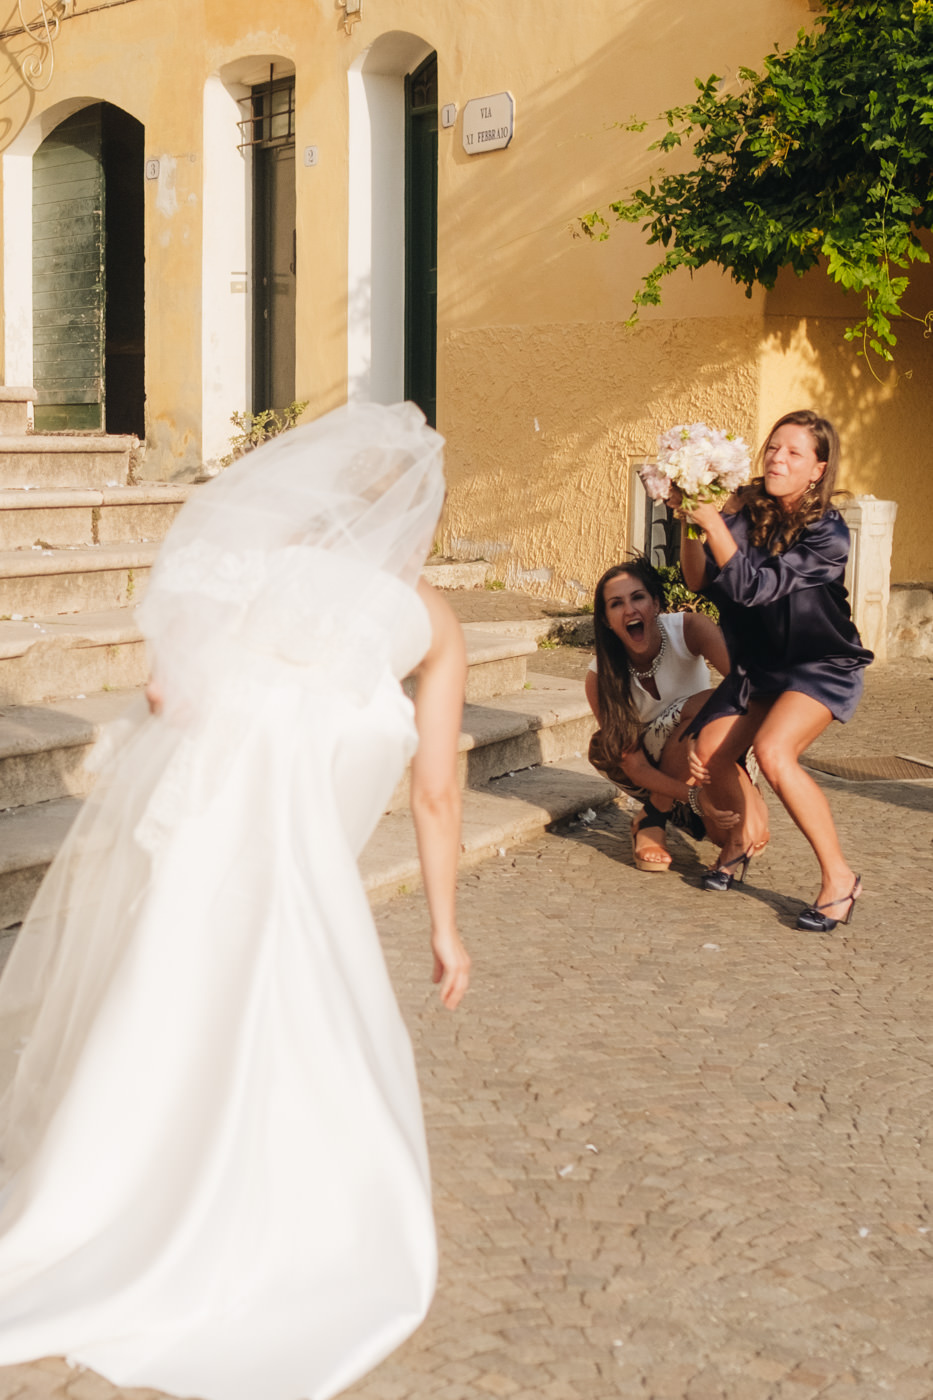 matrimoni_all_italiana_fotografo_matrimonio_cinque_terre-51.jpg